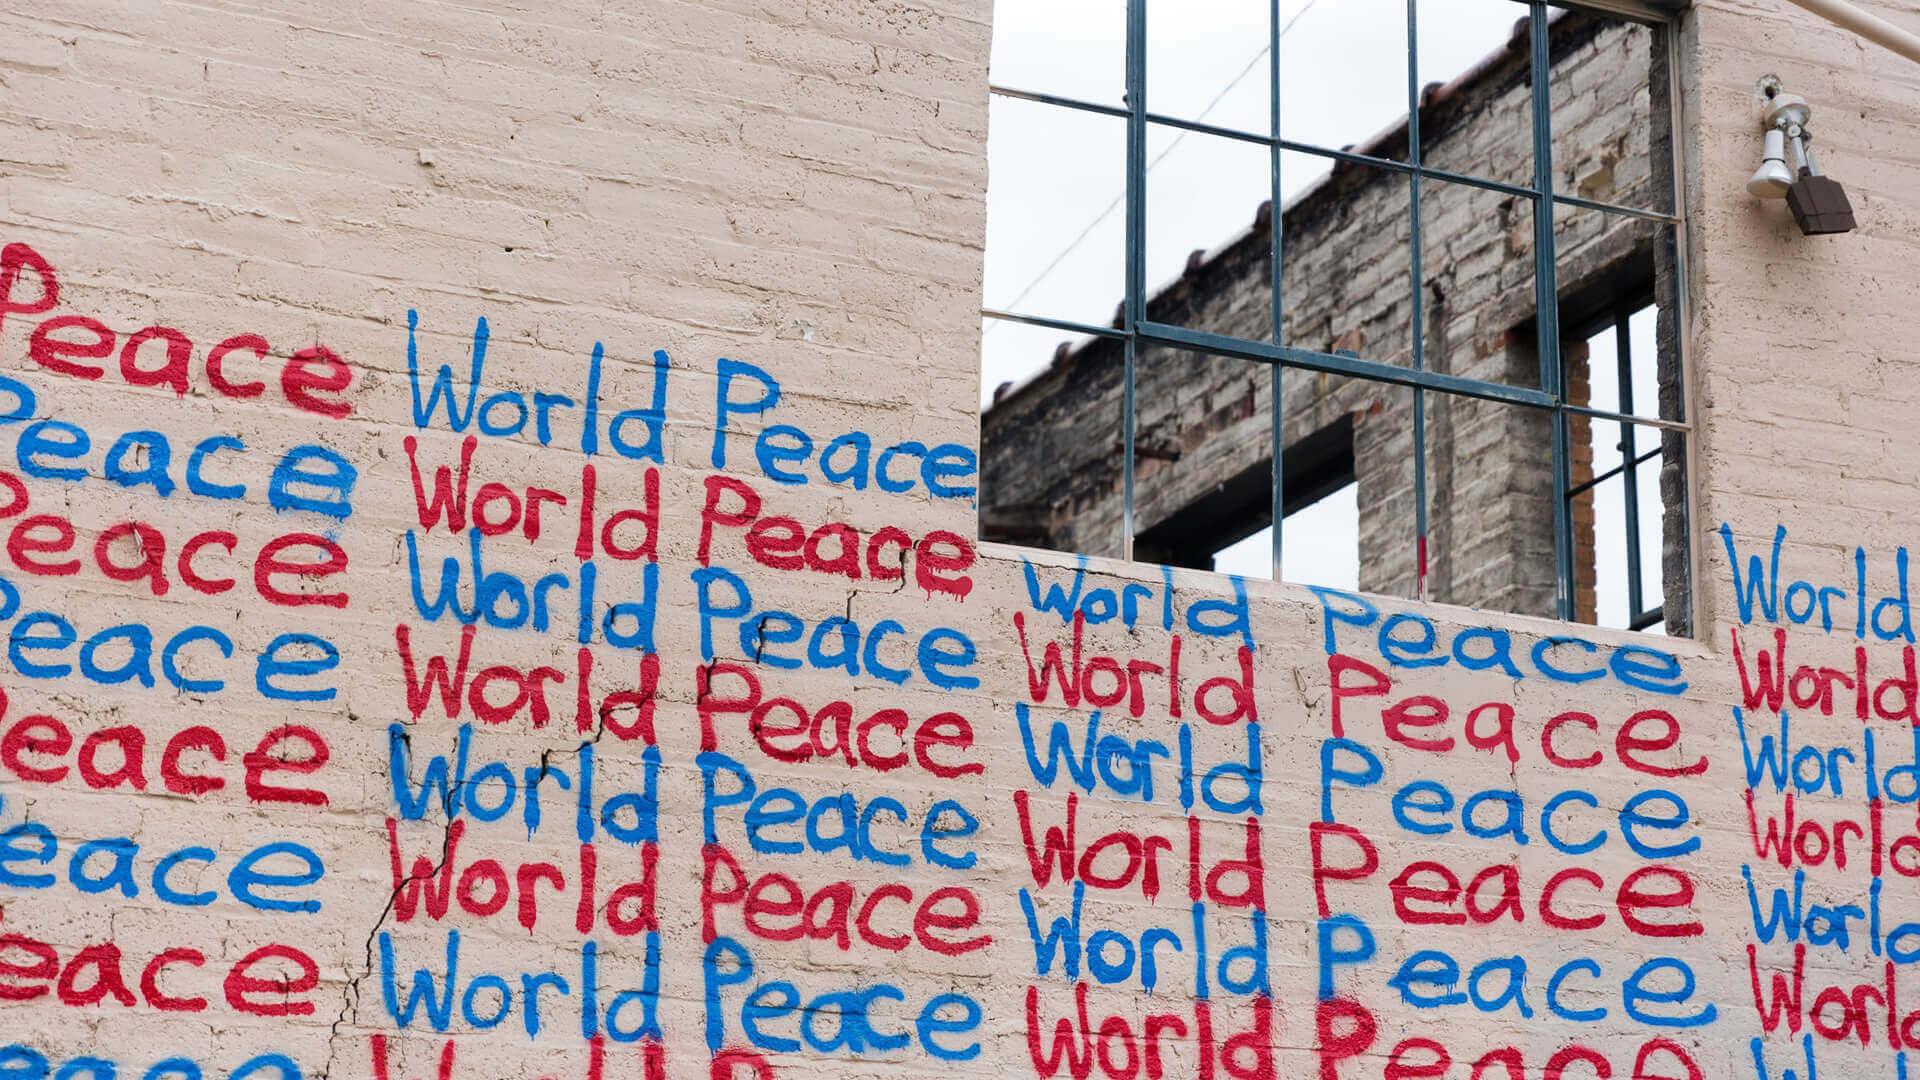 mural com as palavras Wold Peace